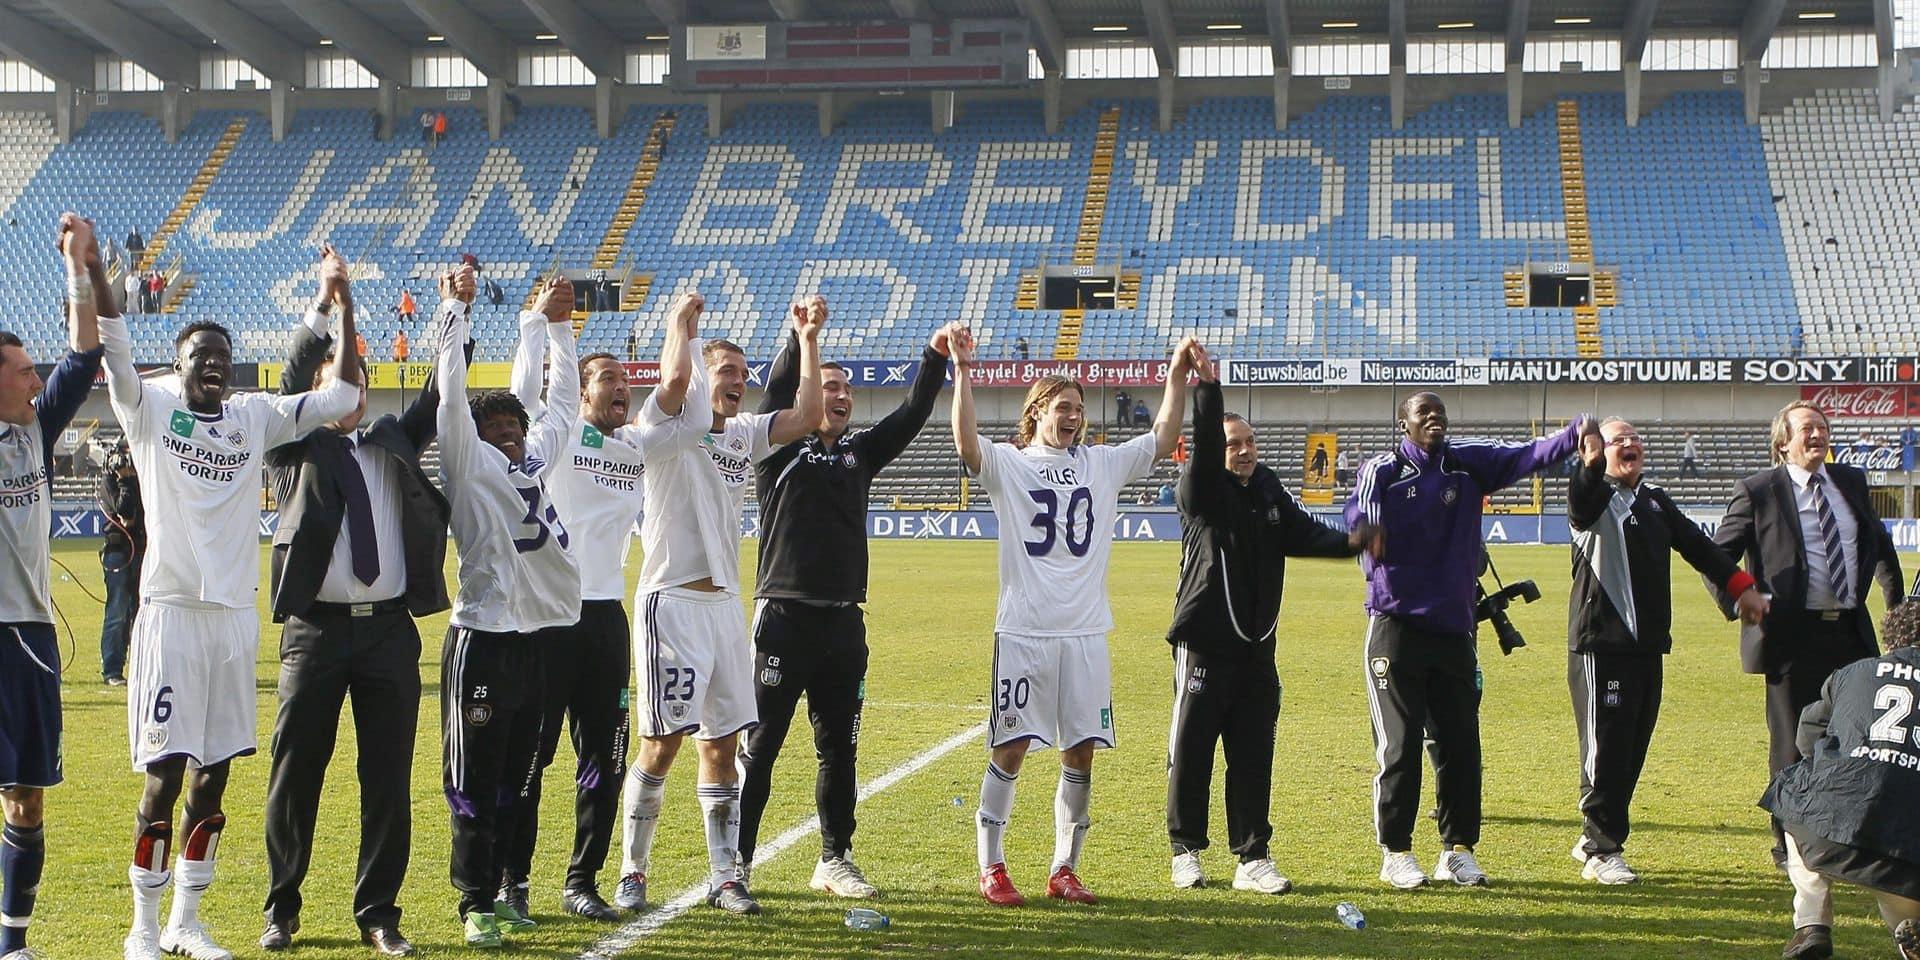 BELGIUM SOCCER PLAY-OFF 1 DAY6 ANDERLECHT CHAMPION